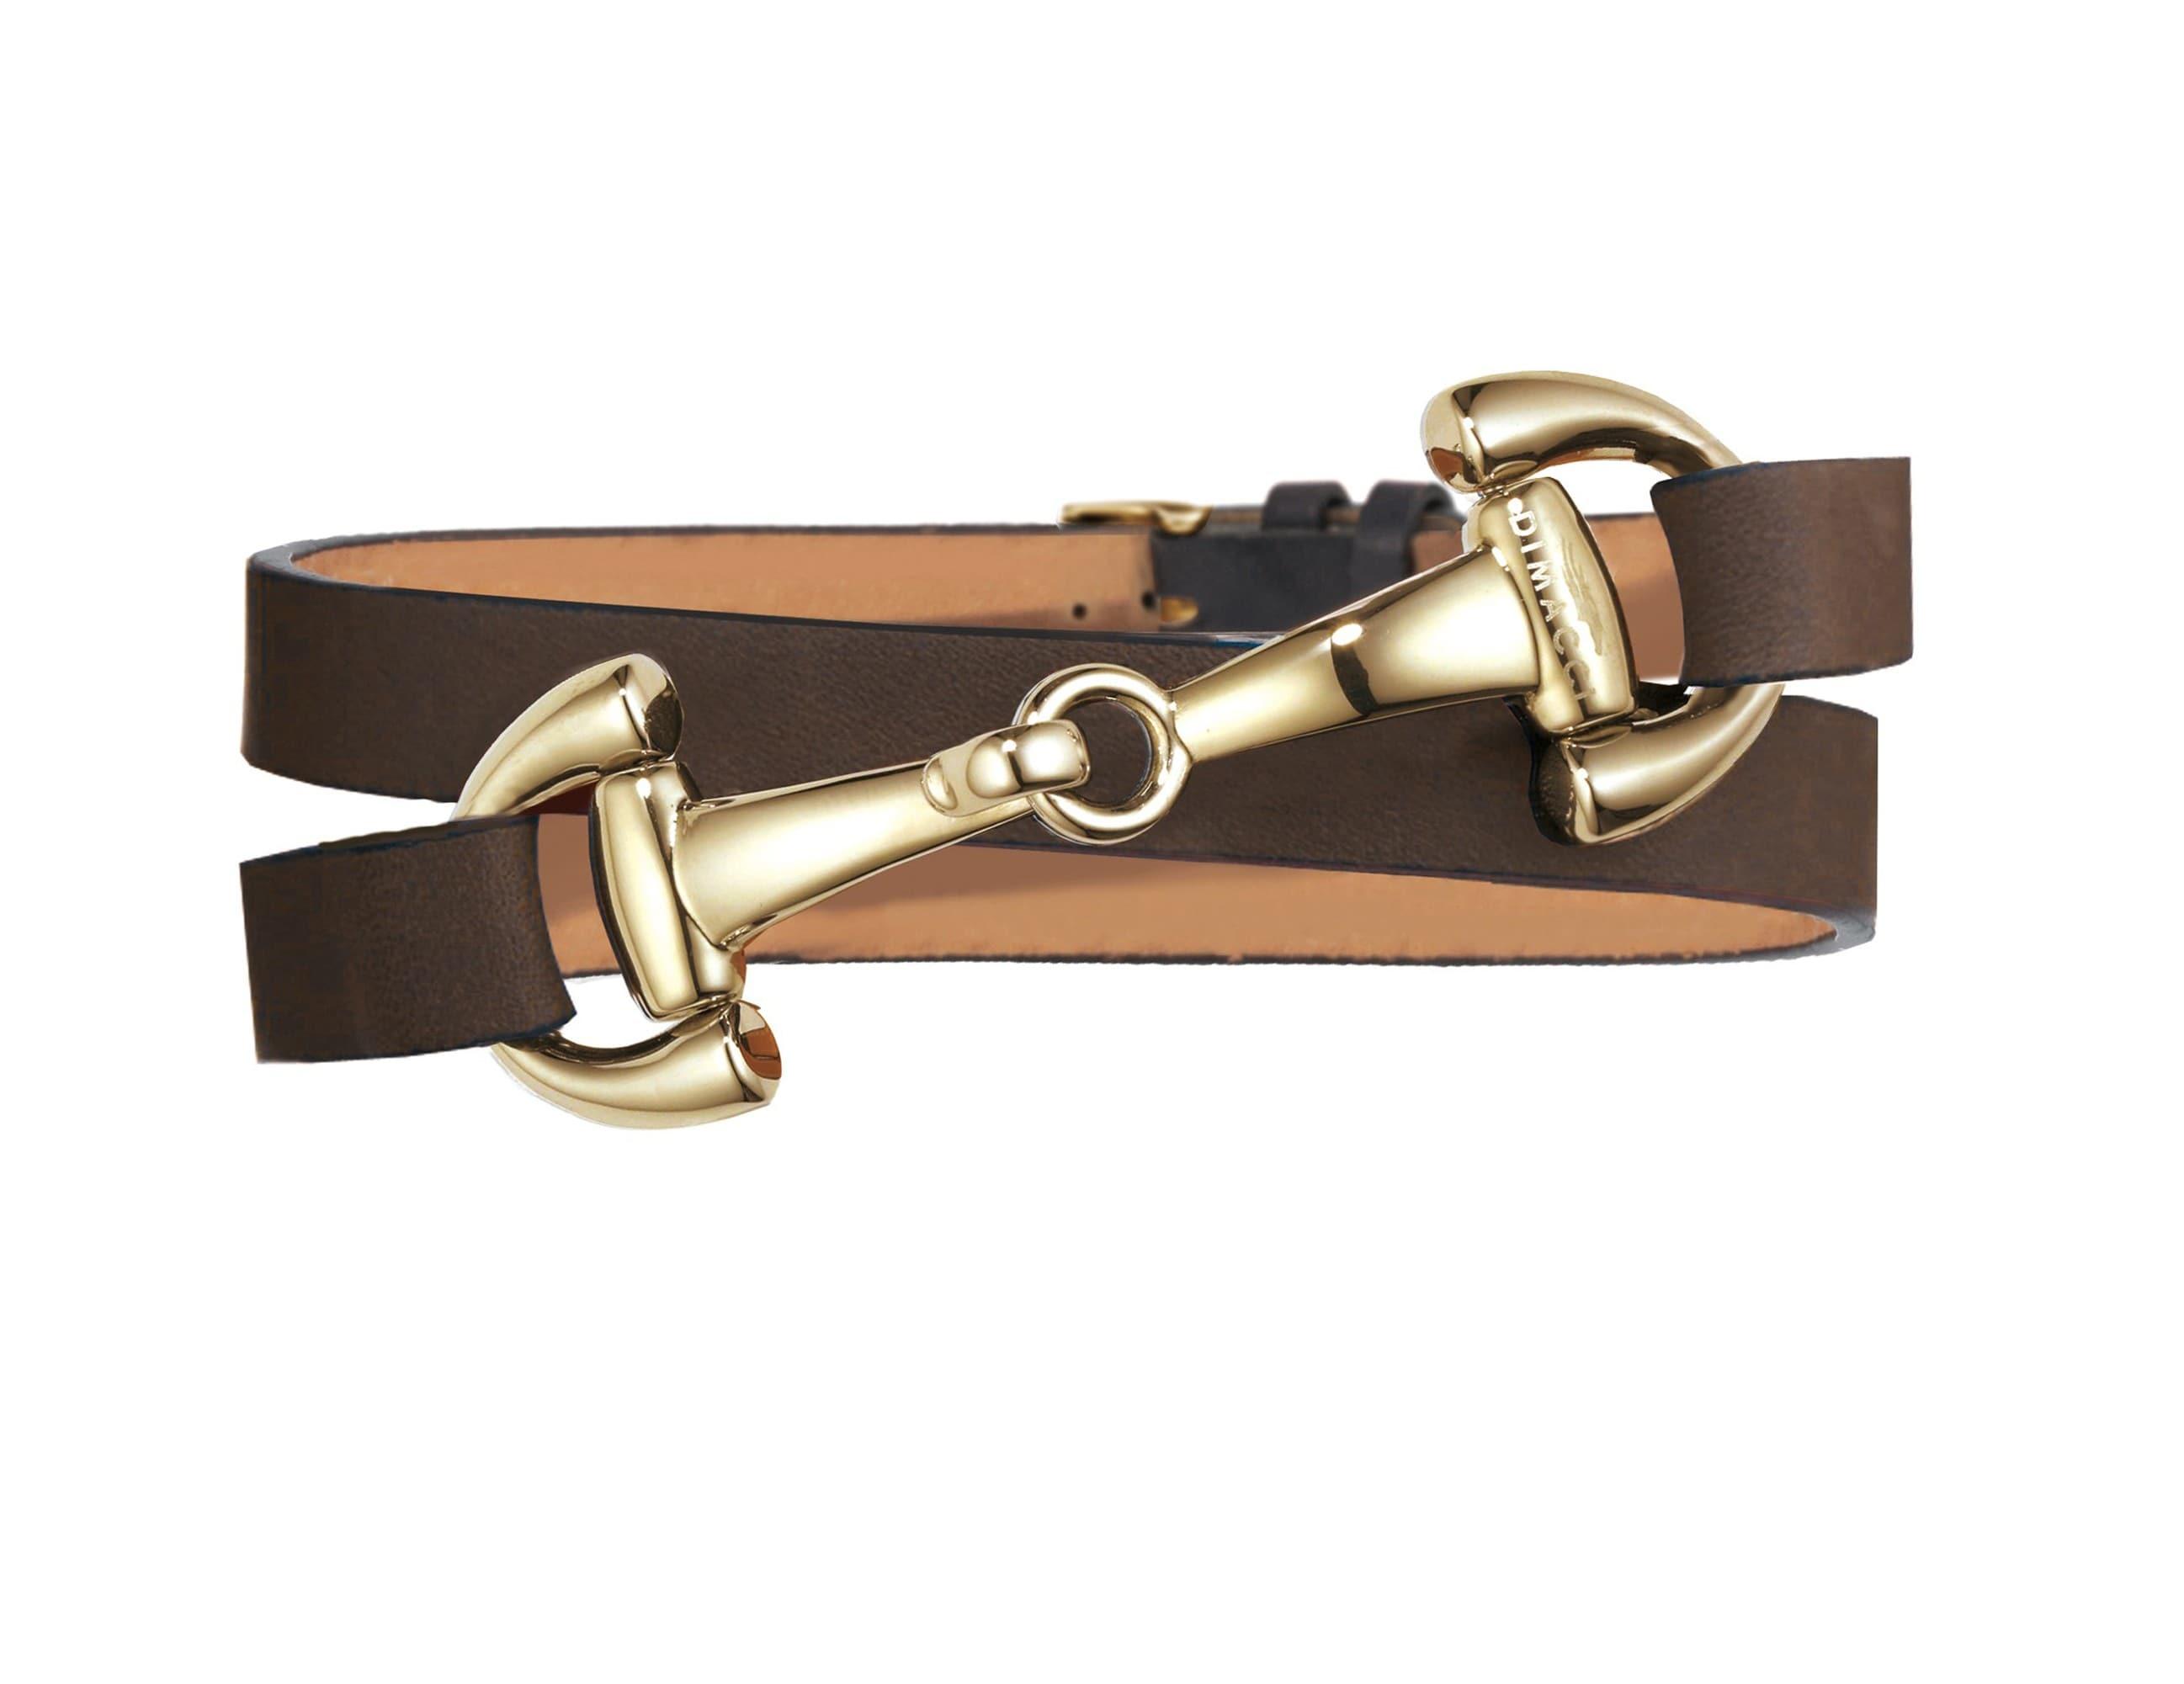 dimacci-ingrids-favoriten-brun-guld-armband